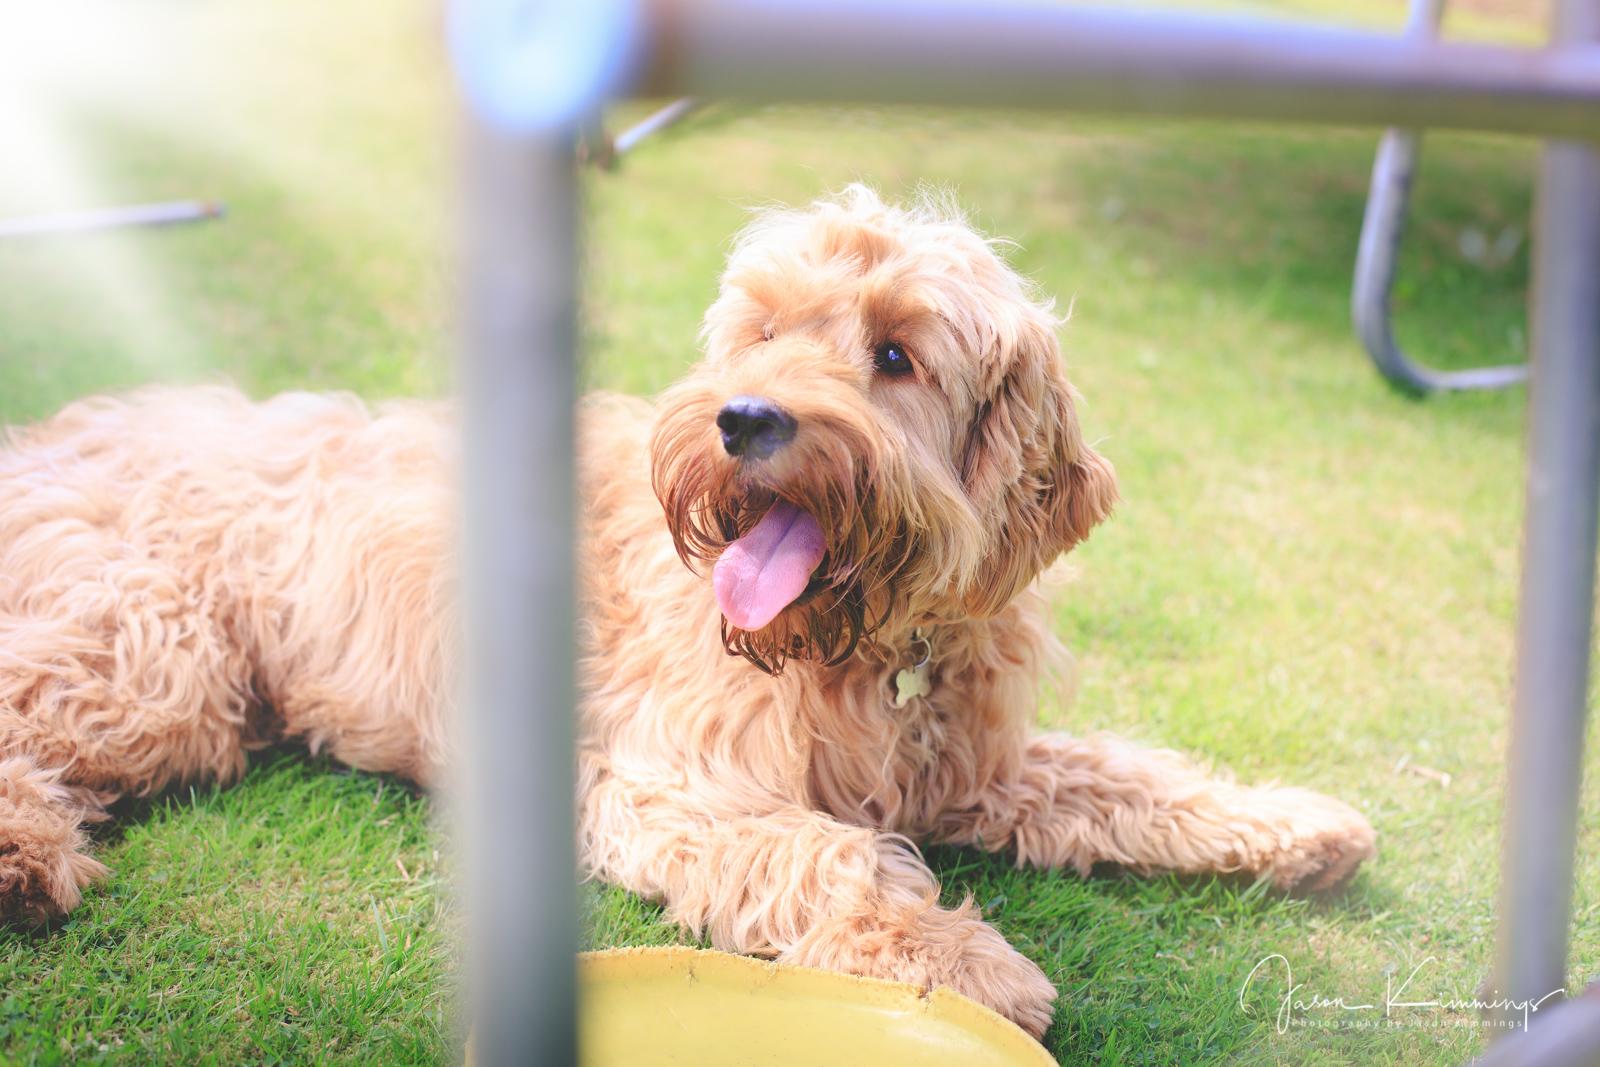 Dog-pet-photography-edinburgh-glasgow-west-lothian-12.jpg